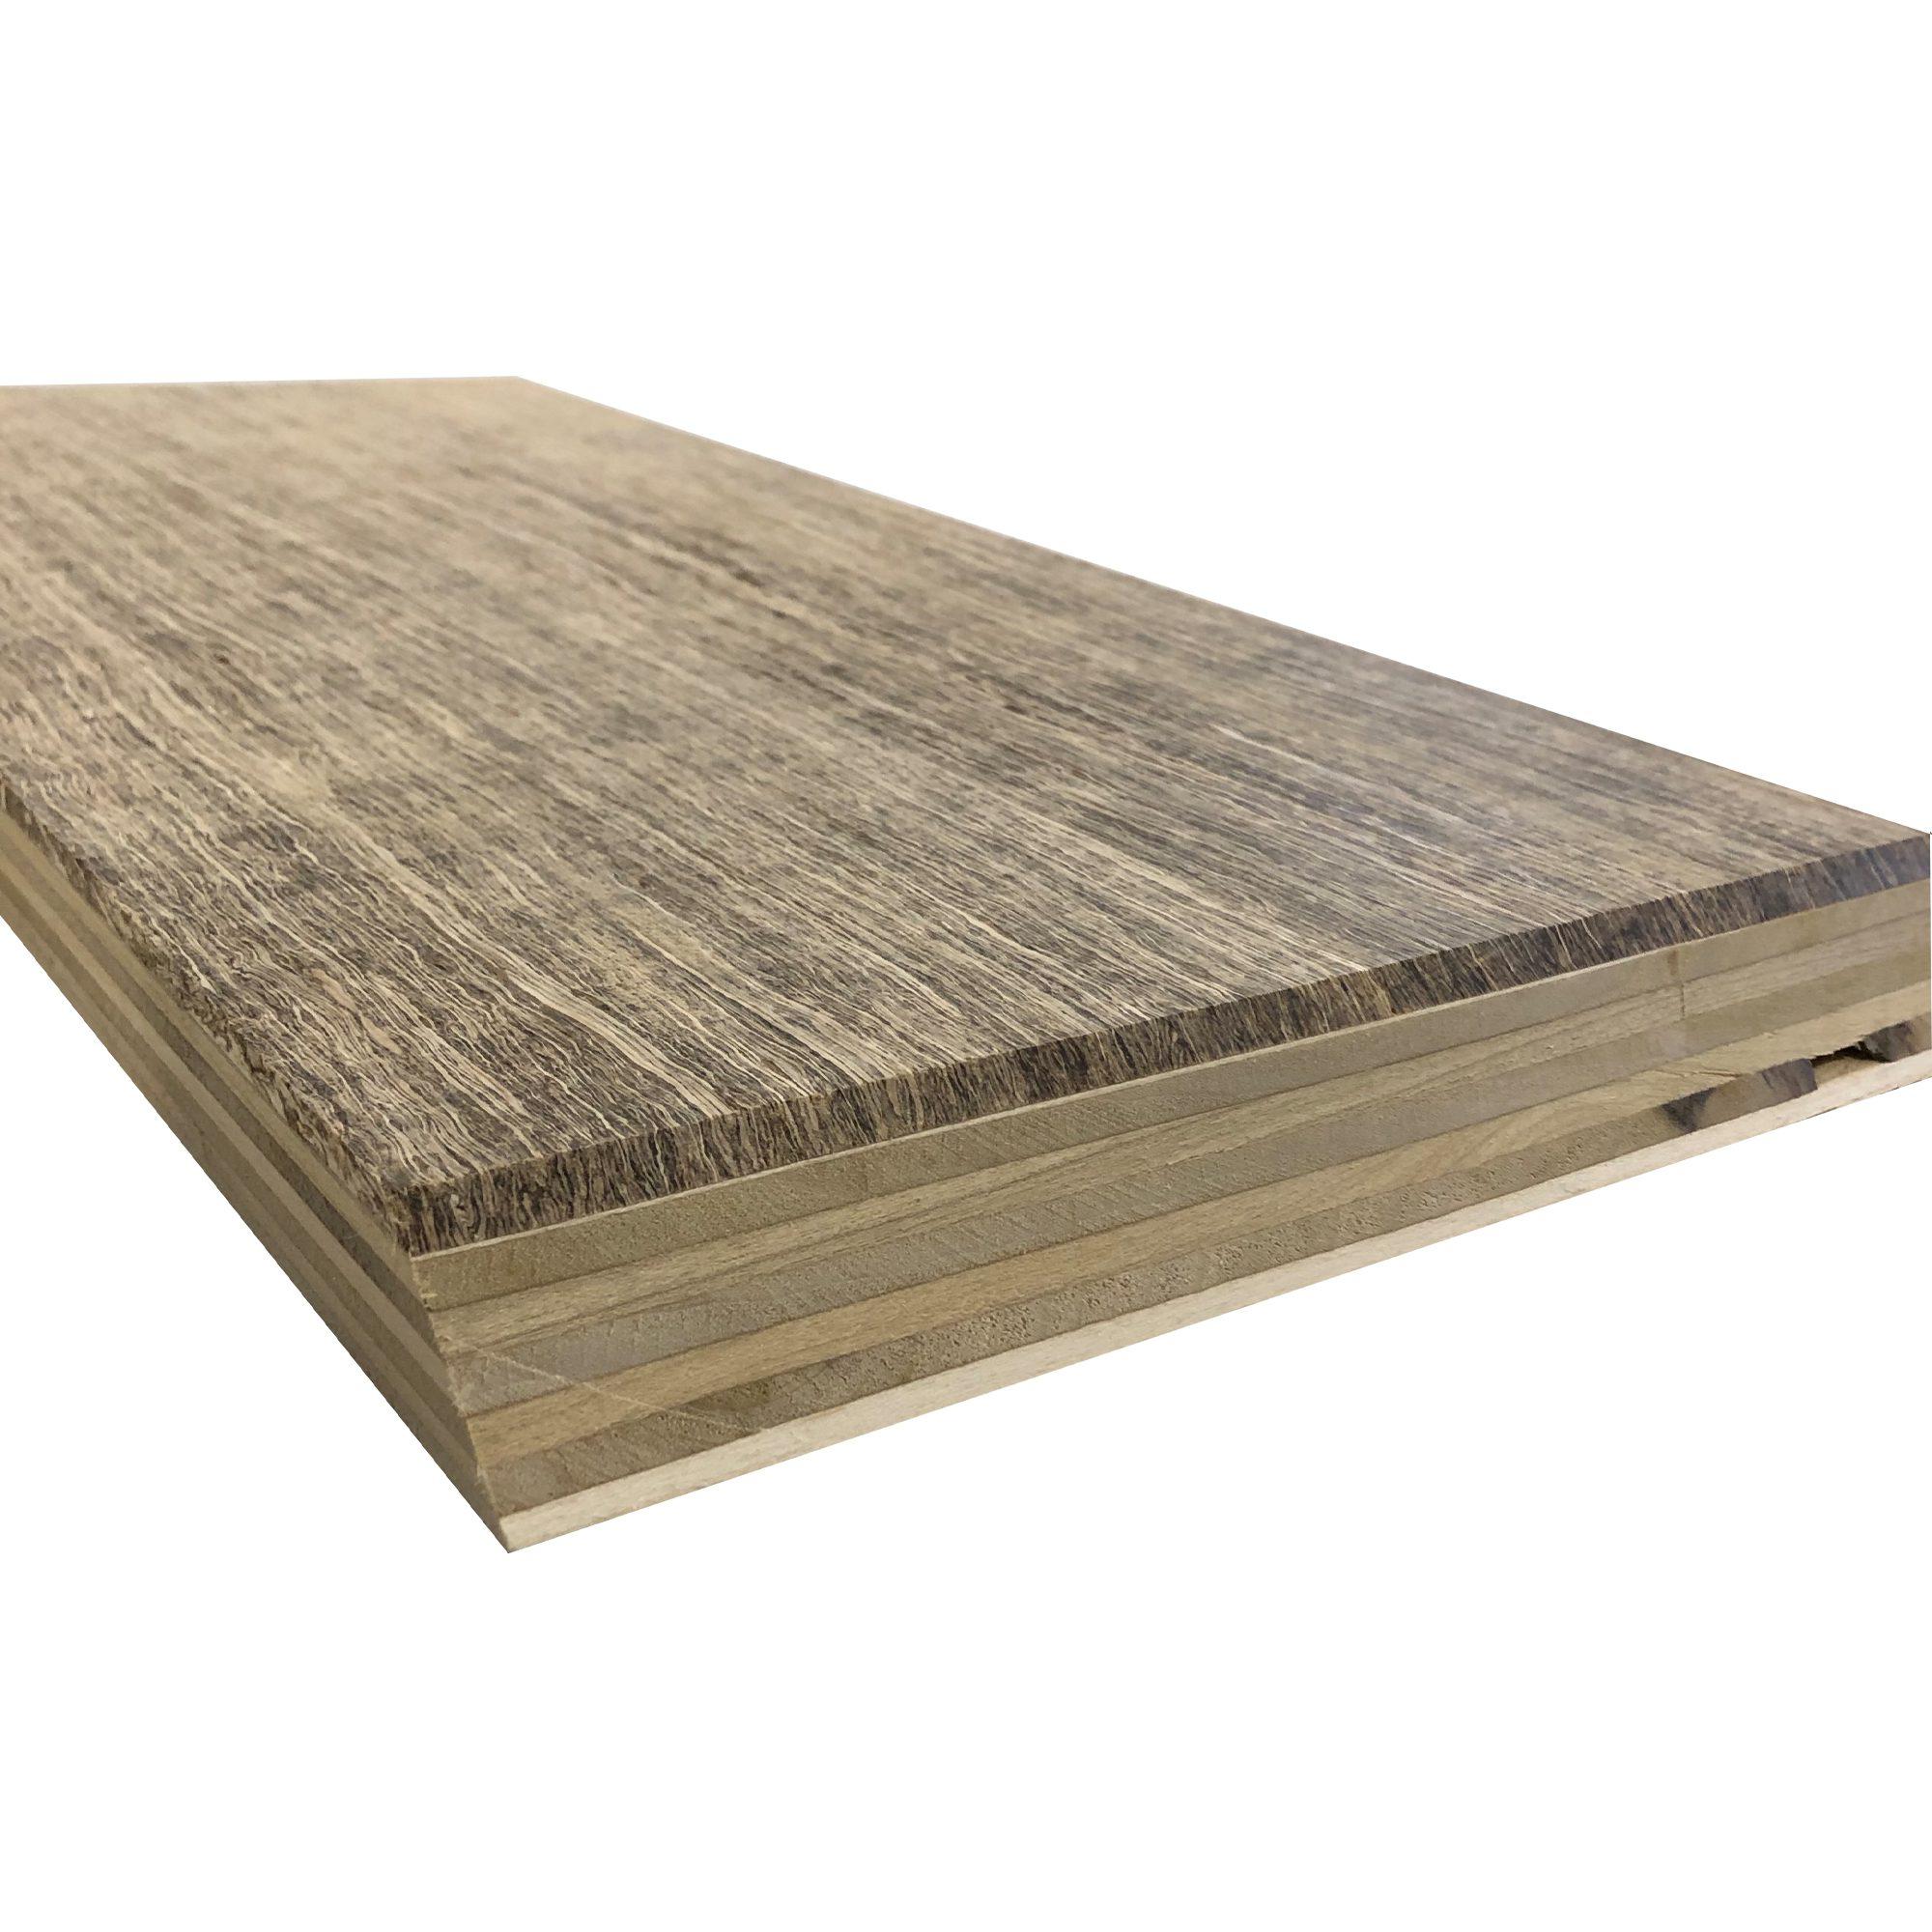 HempWood Paneling and Flooring